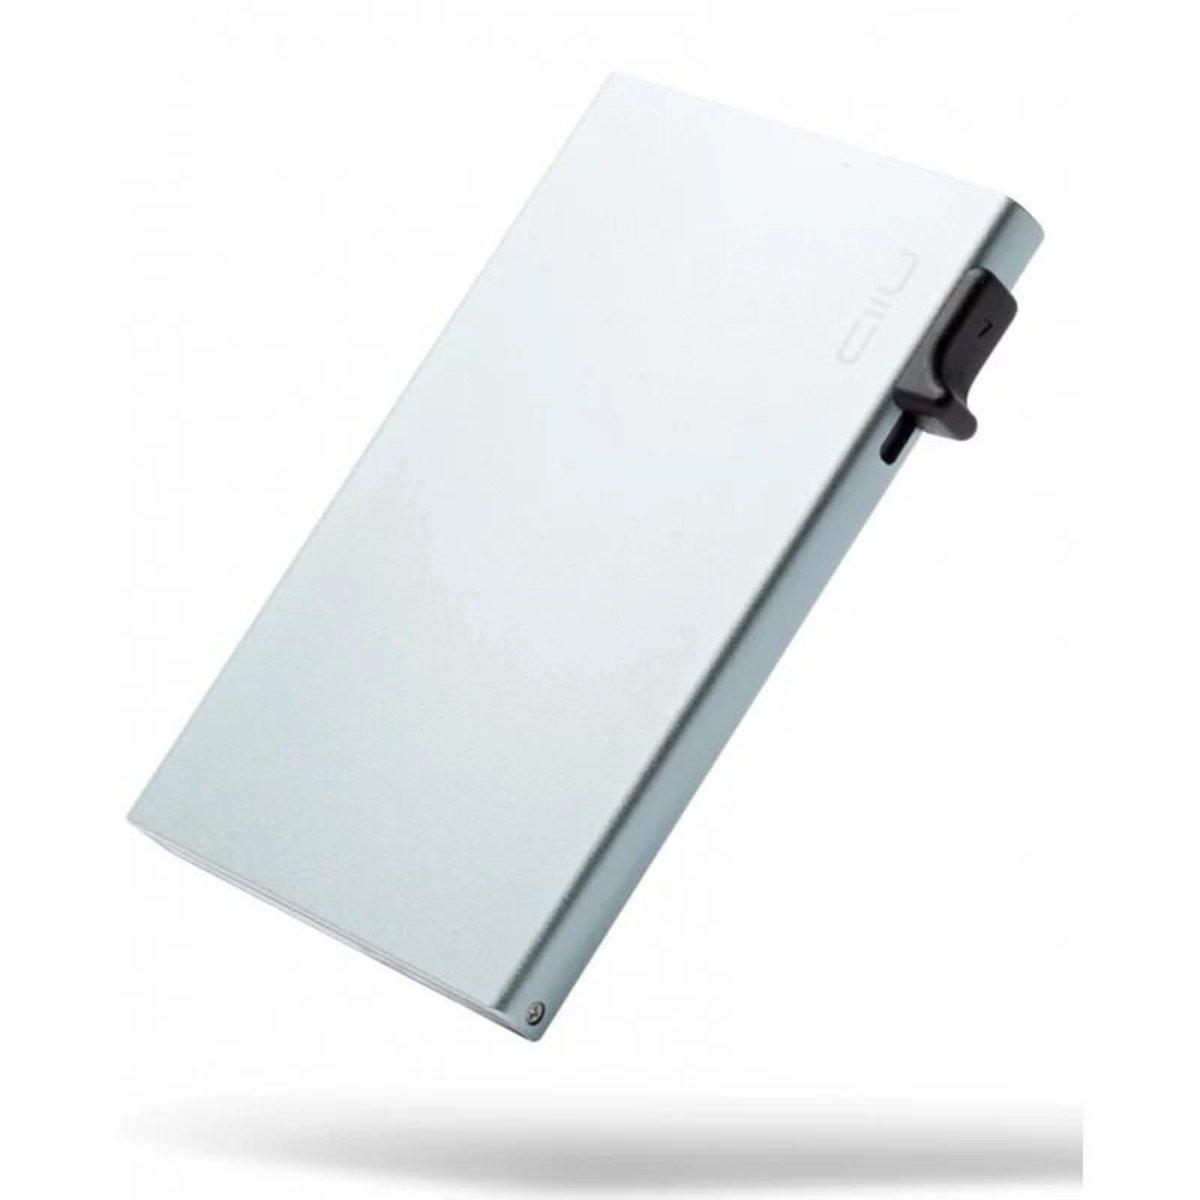 RFID  Security Slide Card Protector - Grey